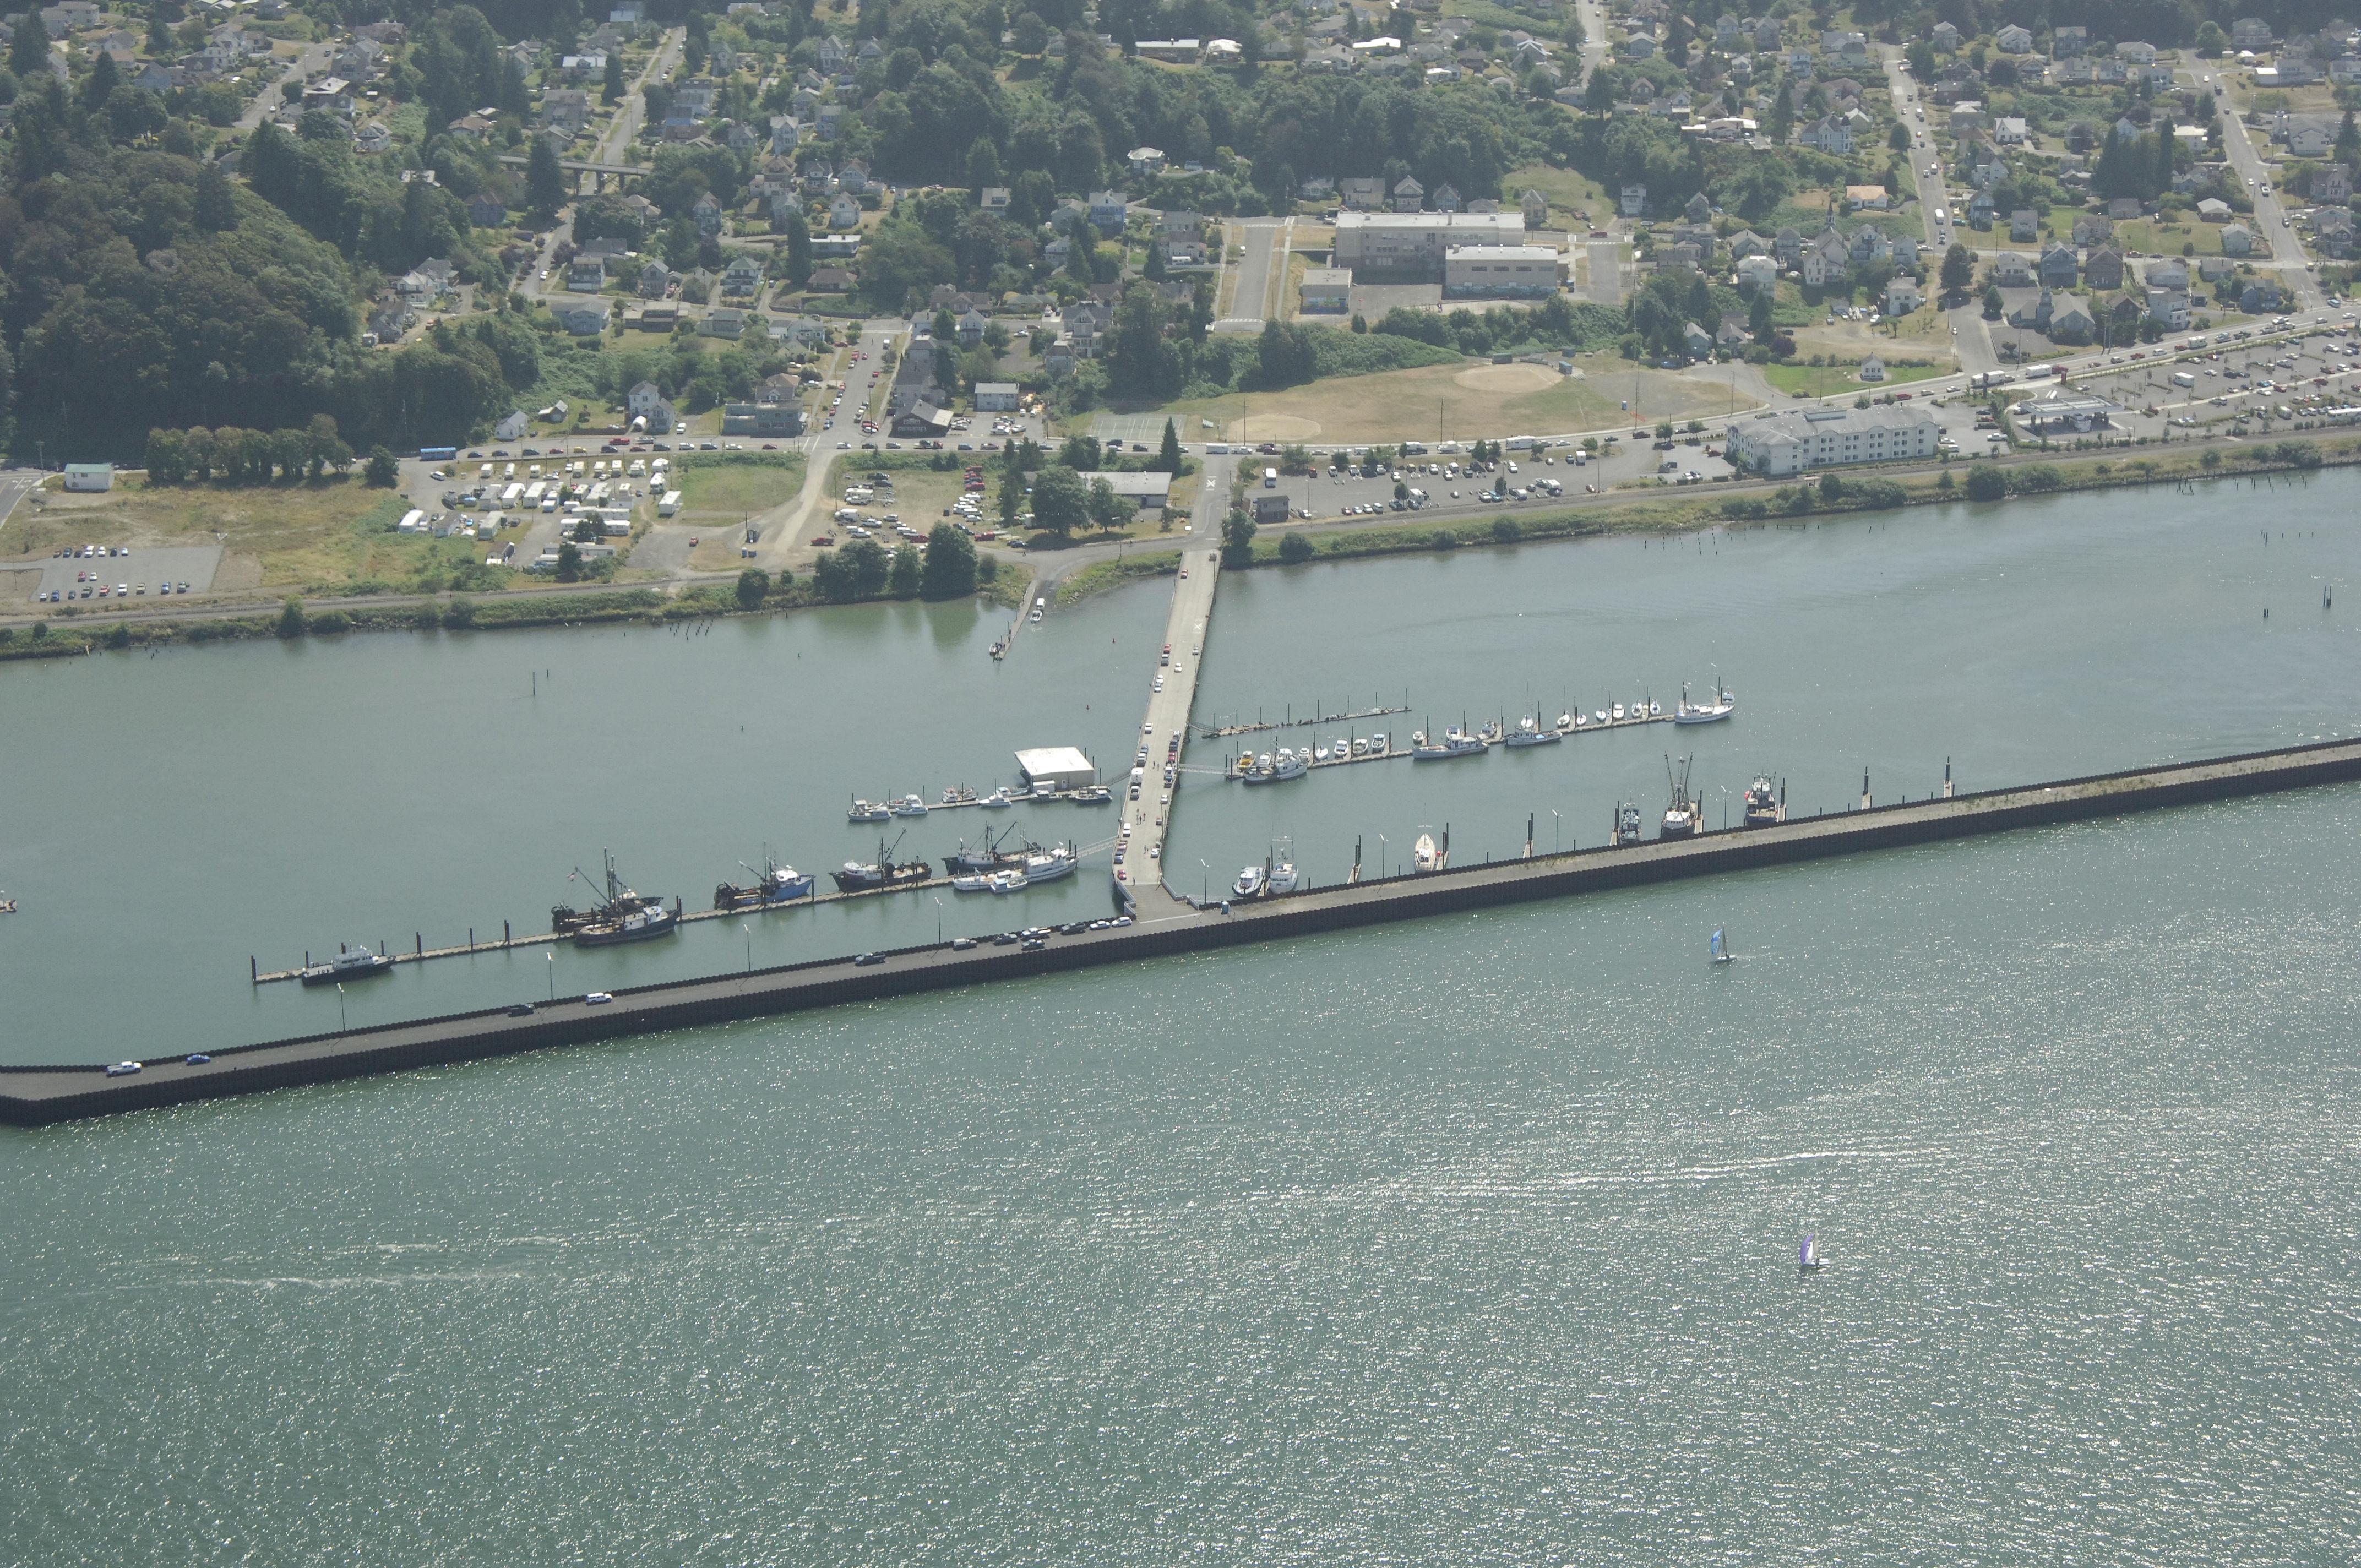 Port Of Astoria Marina East Basin In Astoria Or United